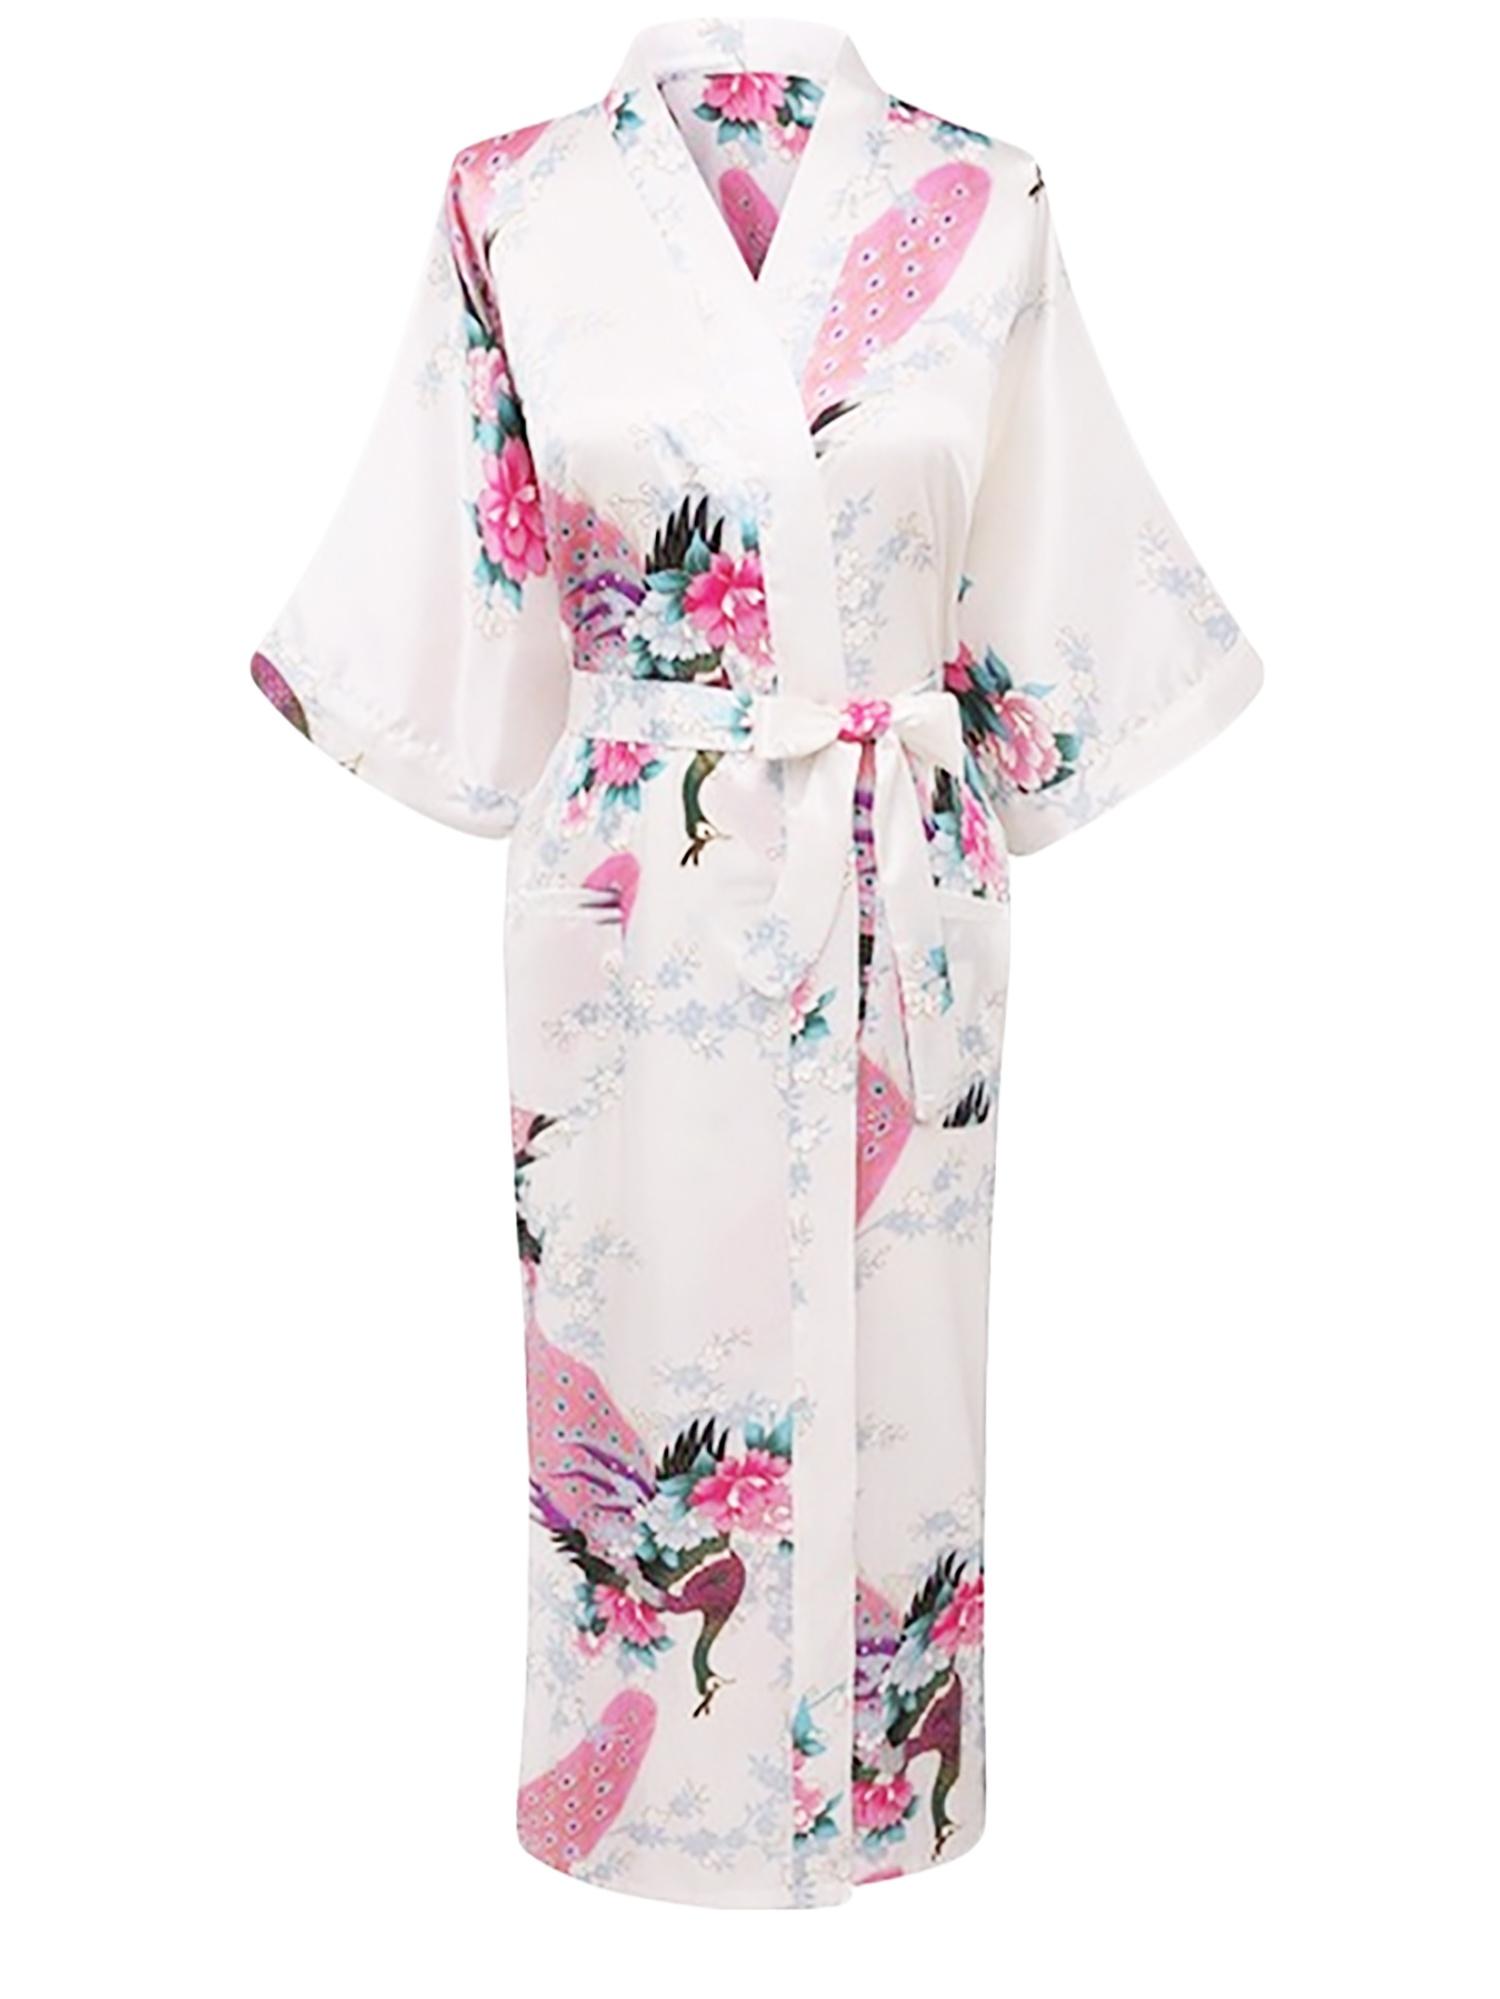 Elegant Long Floral Silk Kimono Womens Robe, Sizes 2 to 20, Brides and Bridesmaid Robes, Lightweight Robe